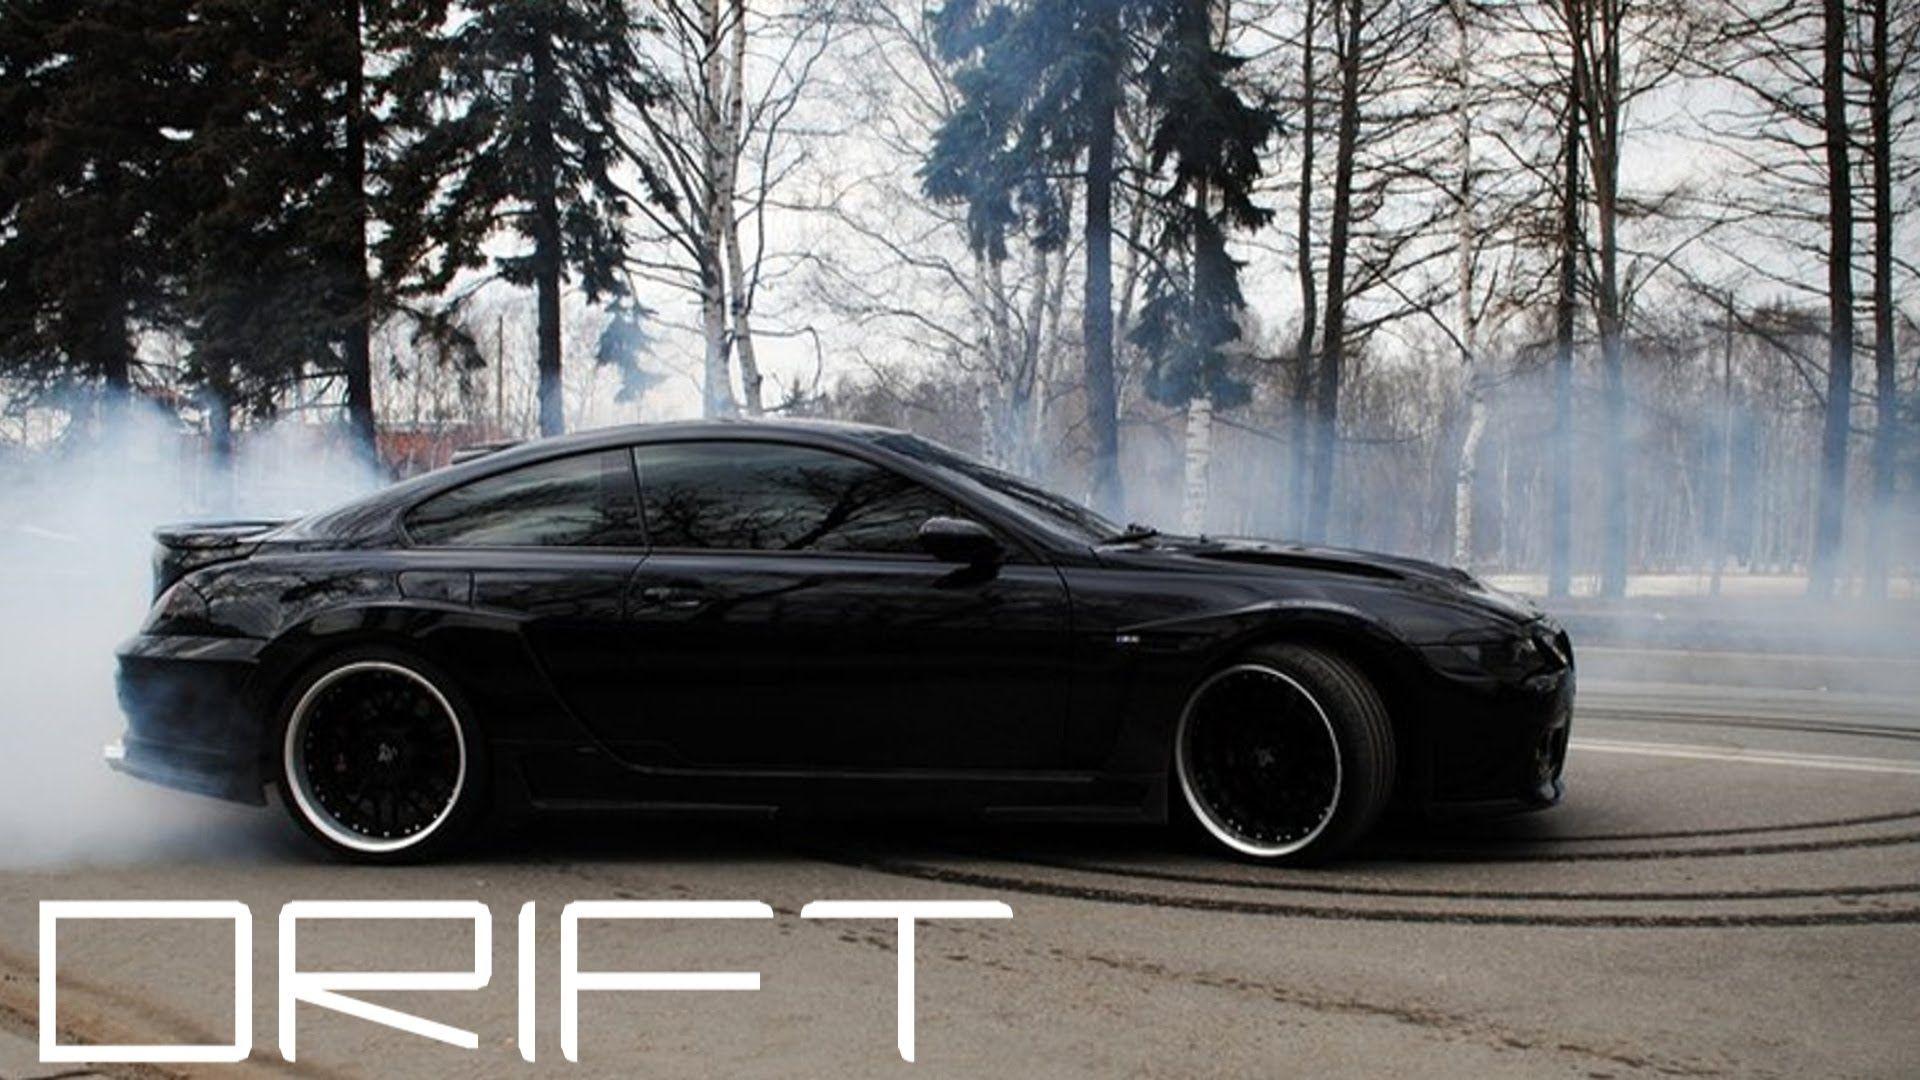 Crazy Hamann Bmw M6 Drift Donuts Powerslides Revs Wheelspins 1080p Hd Bmw M6 Bmw Car Backgrounds